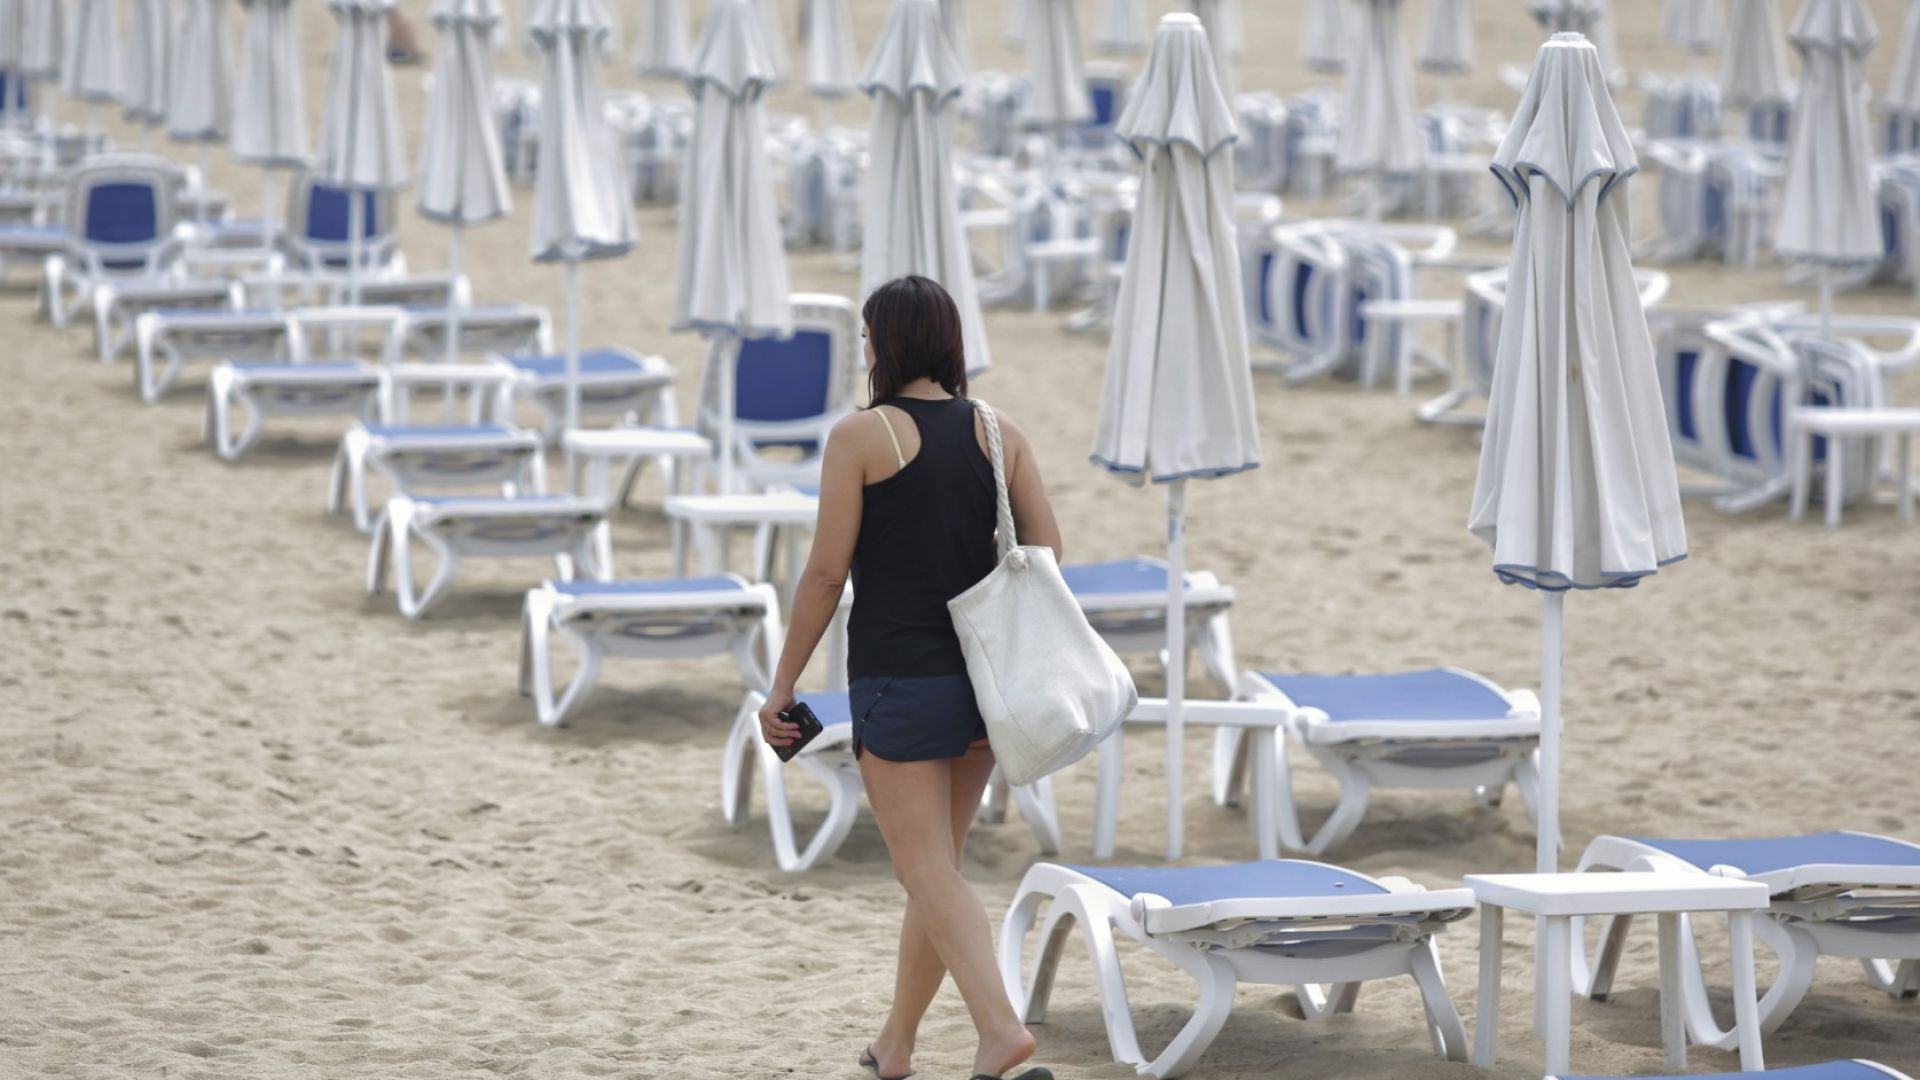 Морските курорти привличат туристи с нестандартни екстри